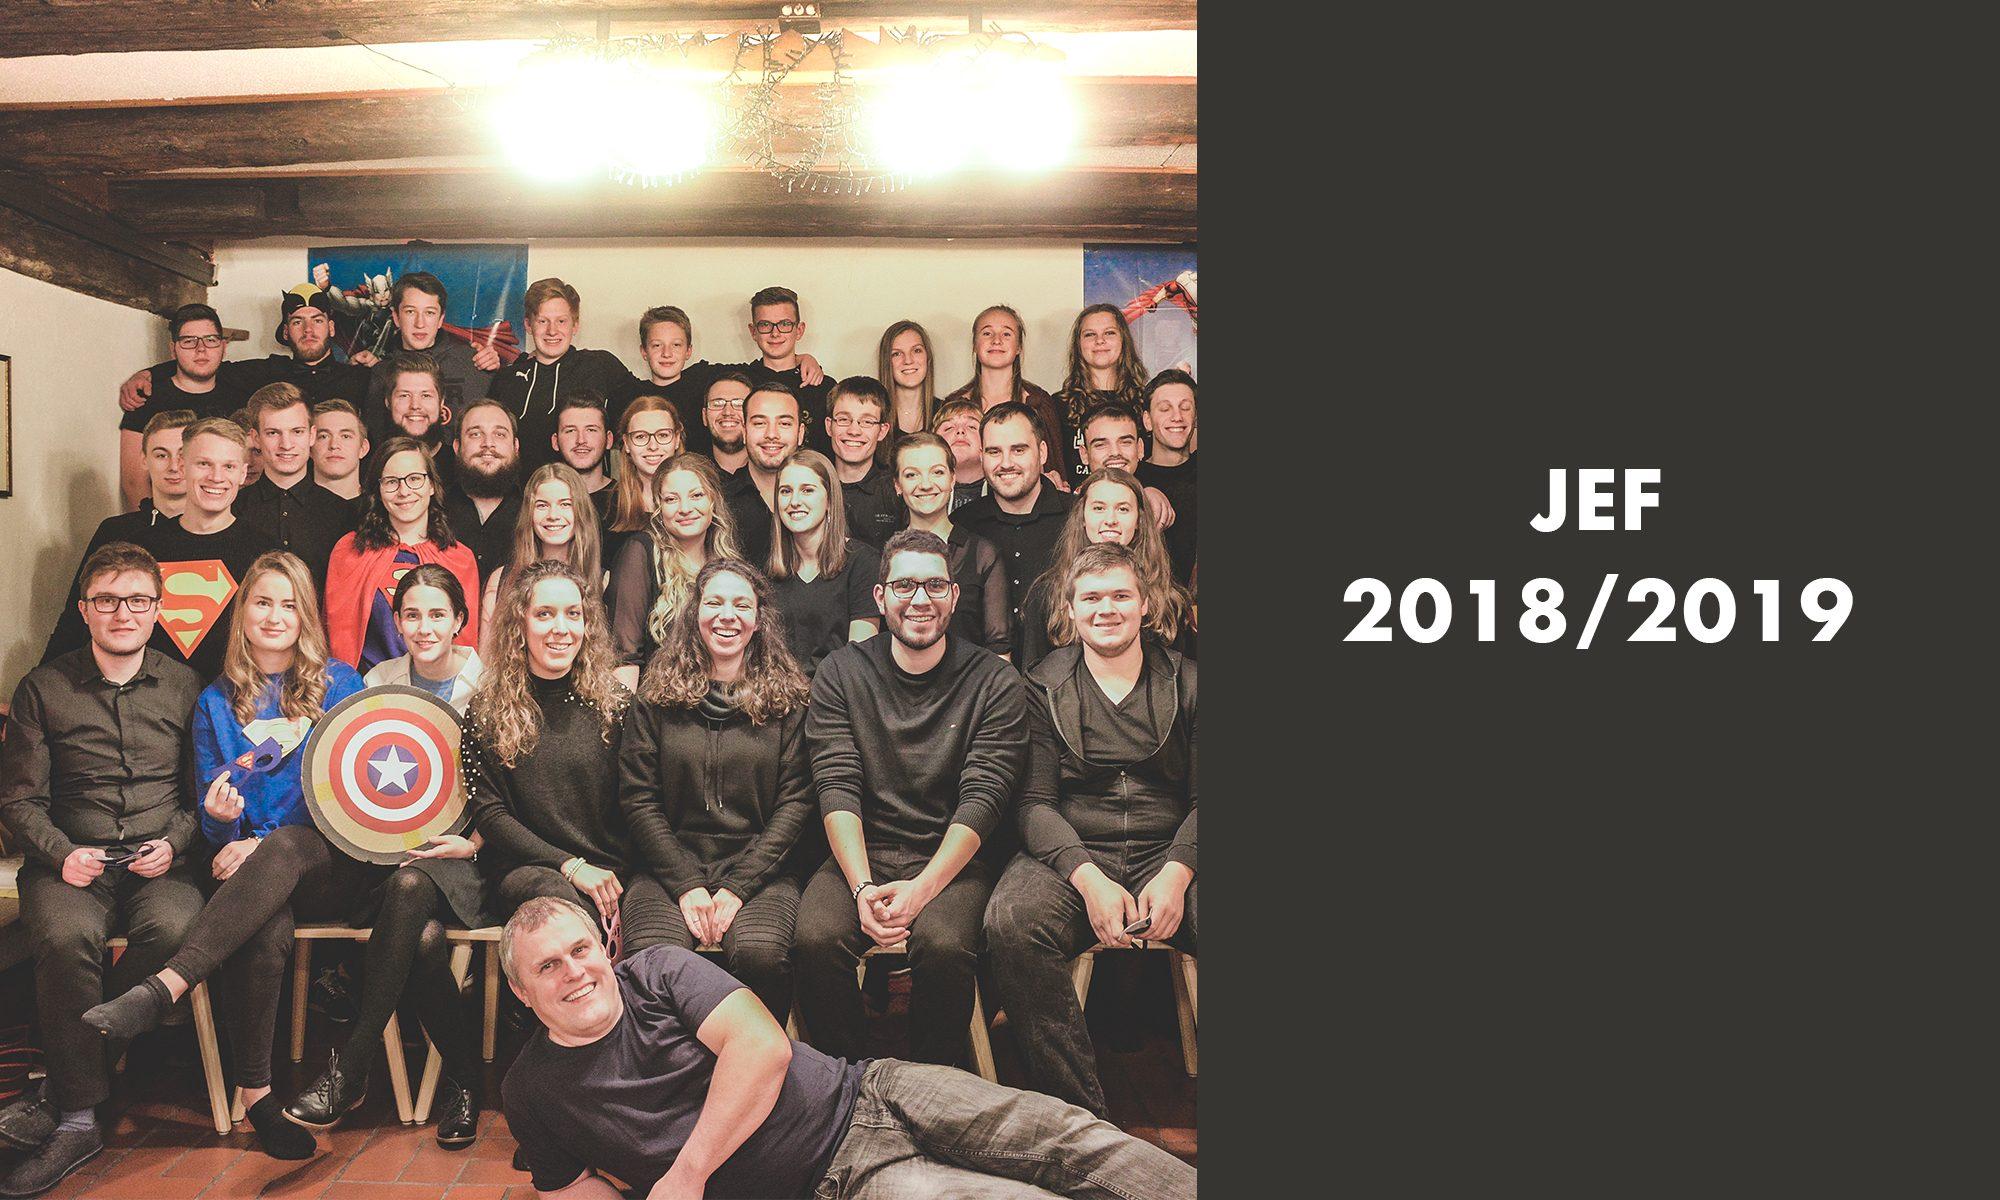 JEF 2018-2019